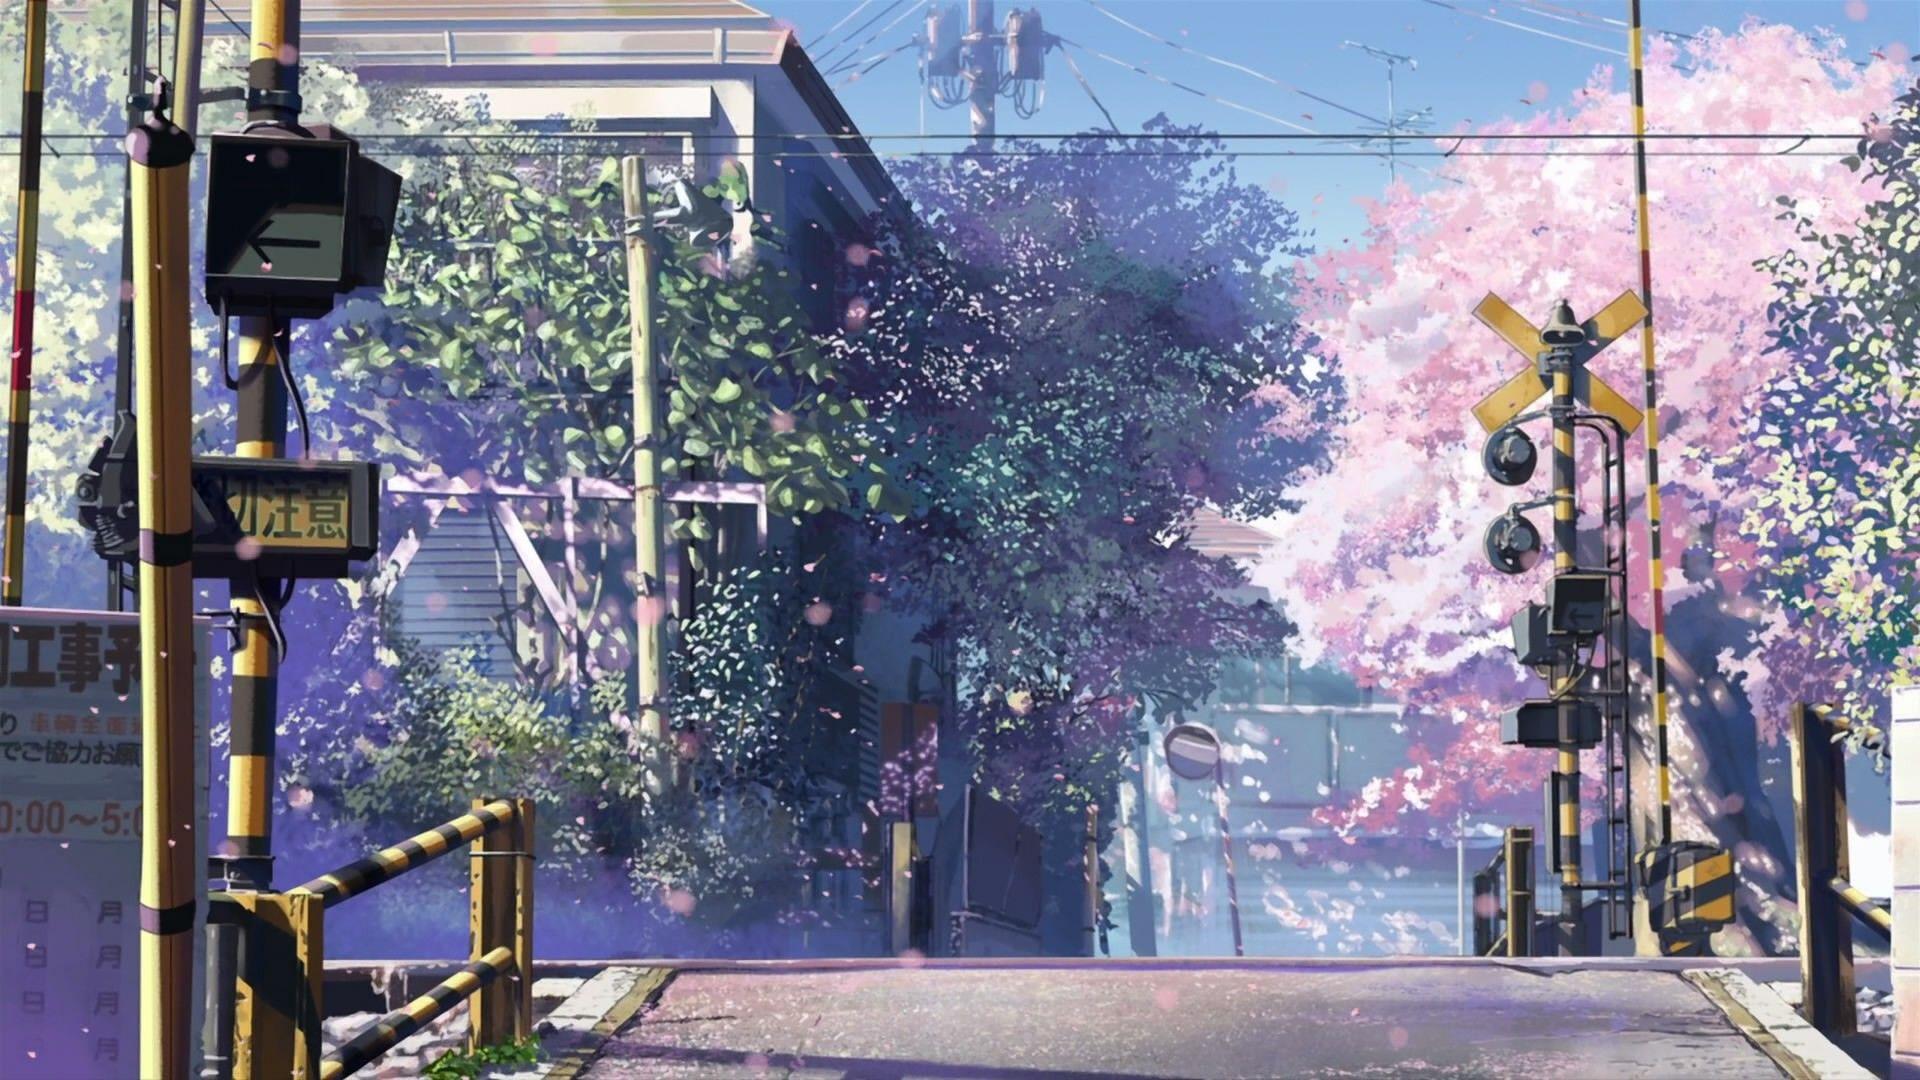 cherry blossoms, 5 Centimeters Per Second Wallpaper No